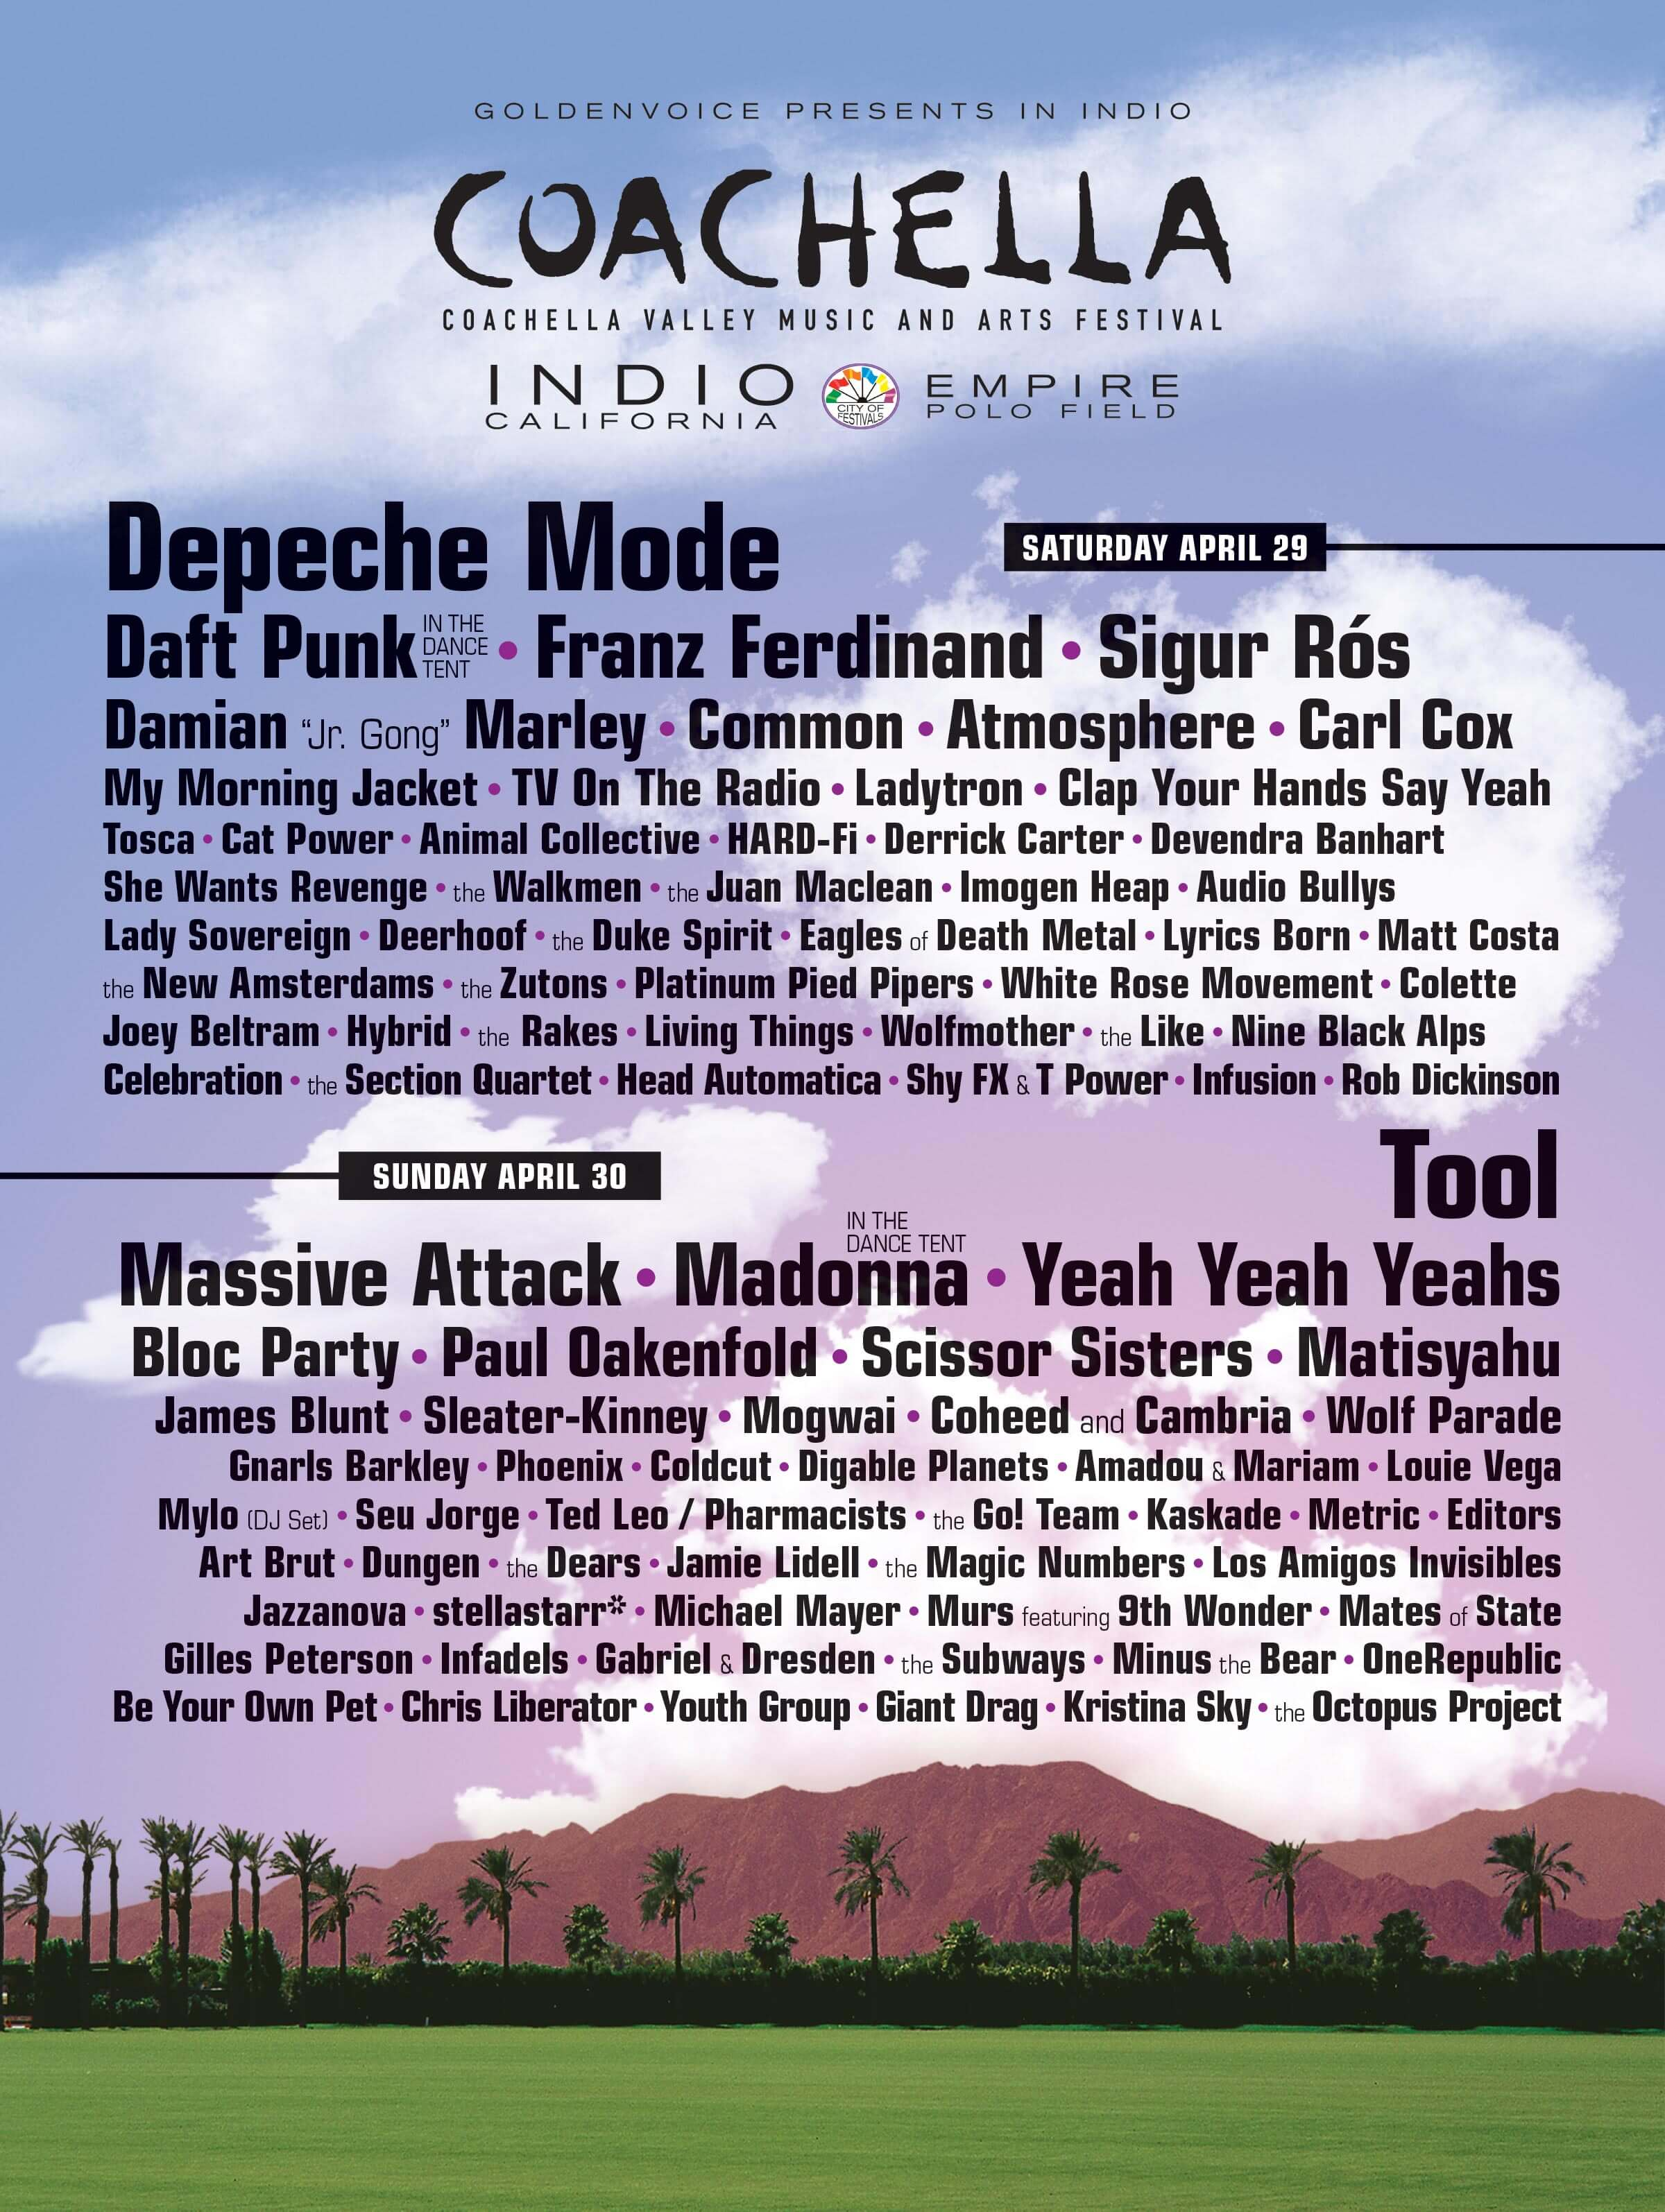 Coachella 2006 Lineup Poster